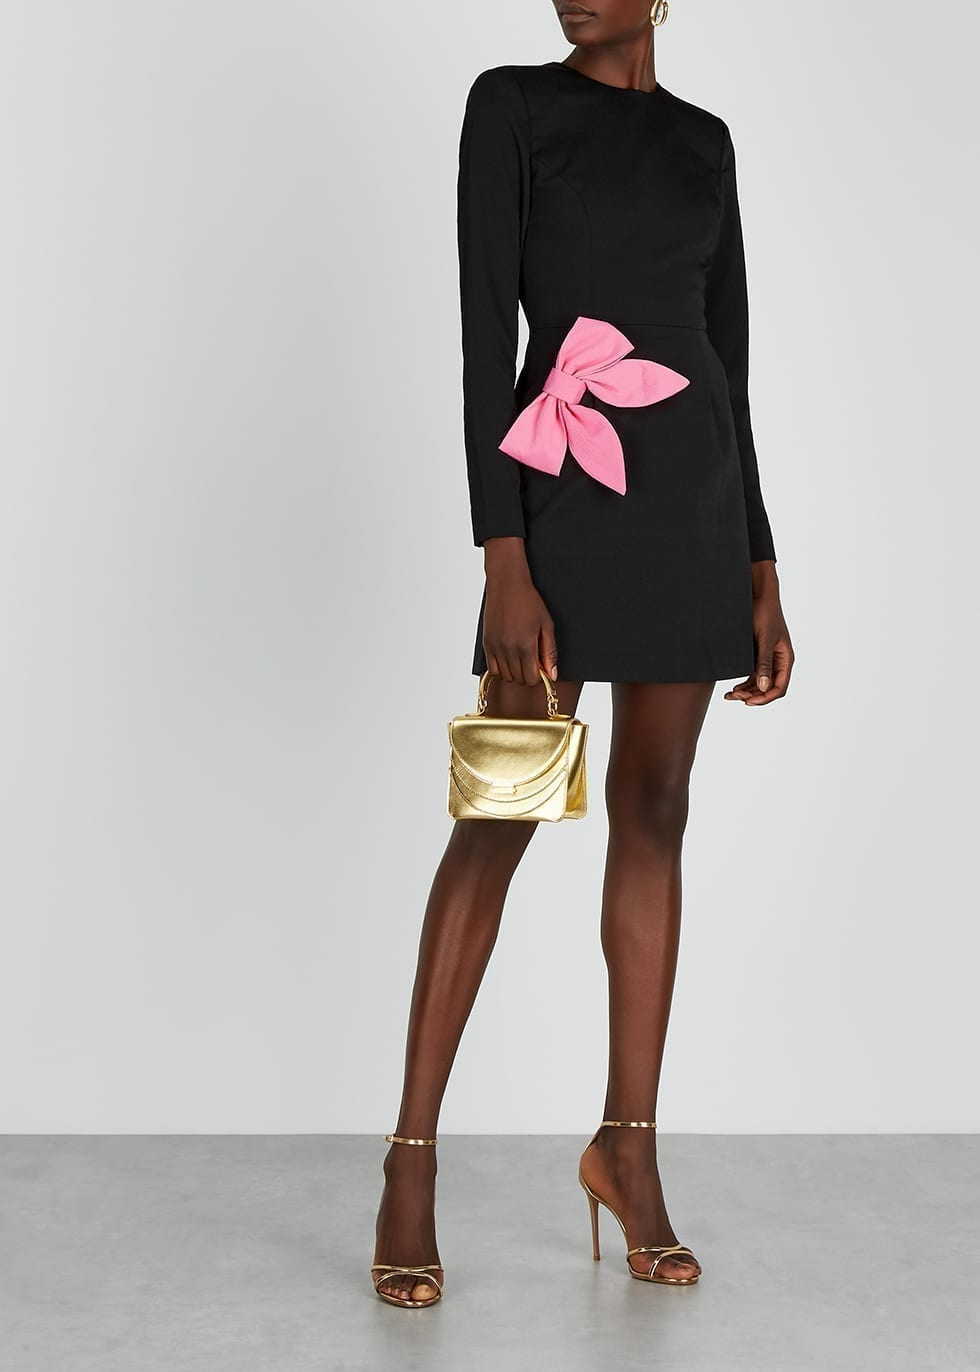 REBECCA VALLANCE Winslow Bow-embellished Mini Dress